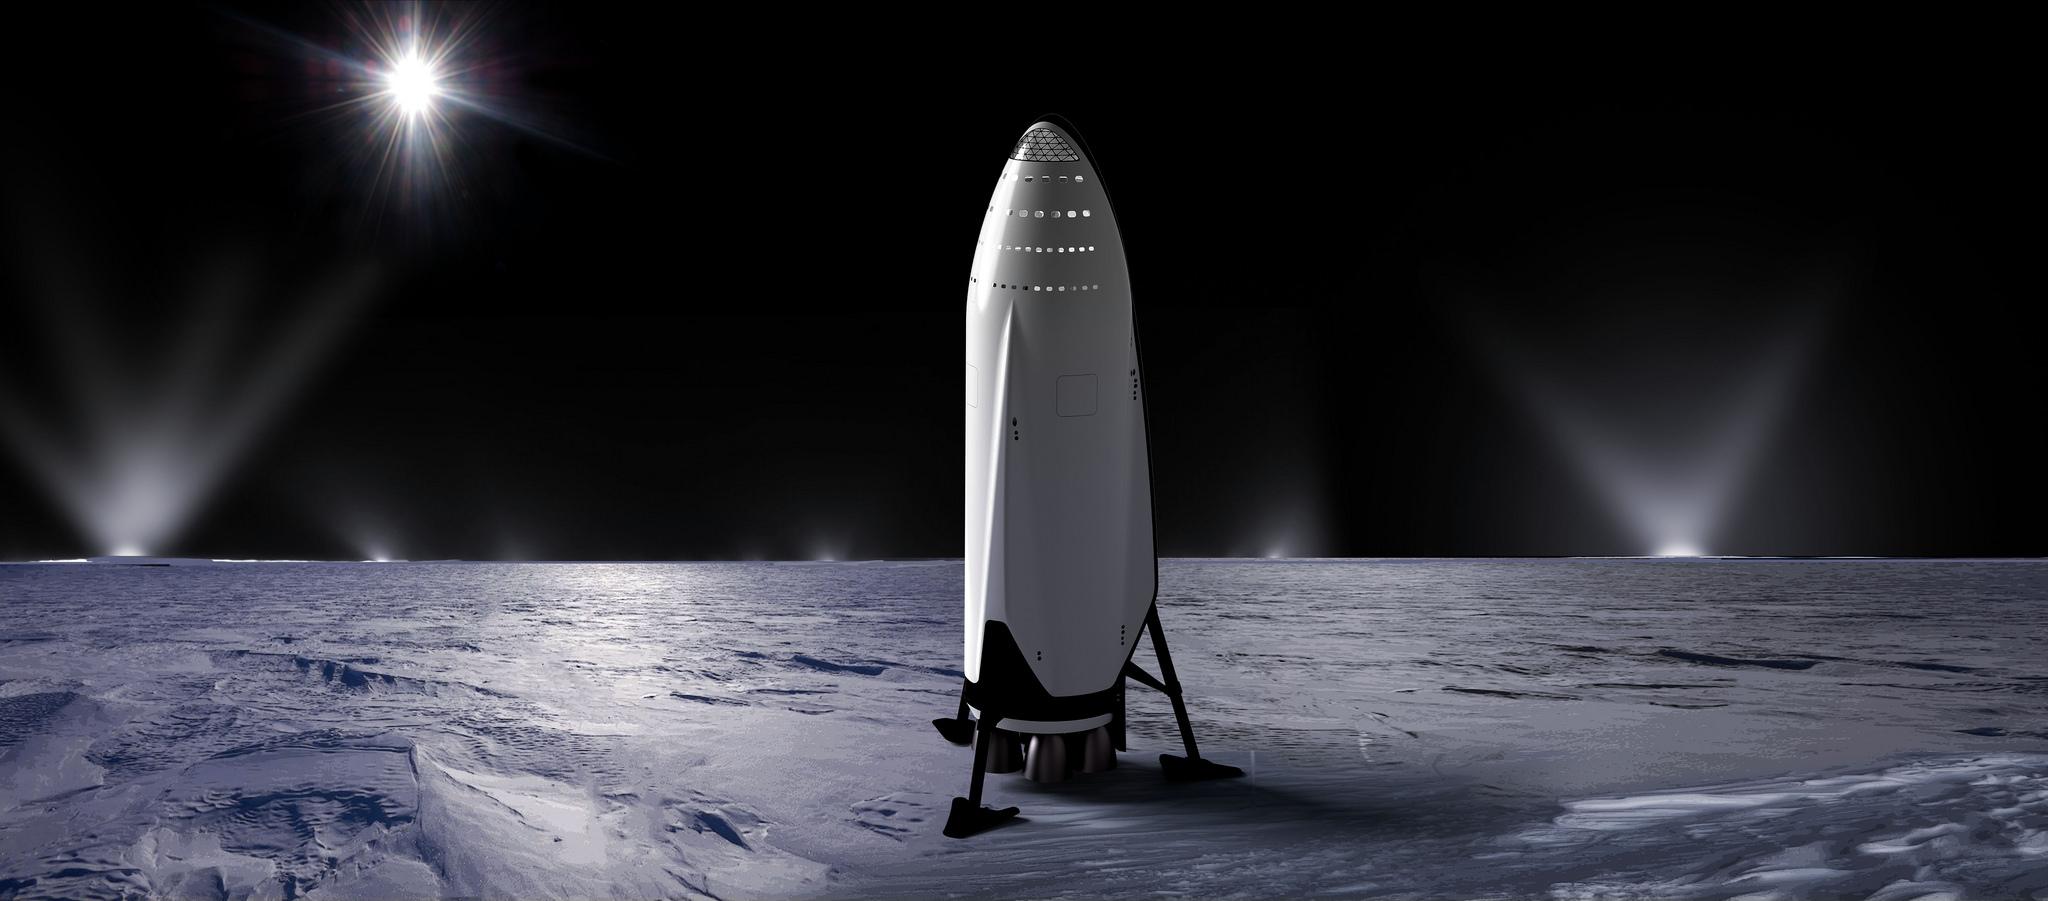 SpaceX skal fly to privatpersoner rundt månen i 2018. Illustrasjonsfoto.